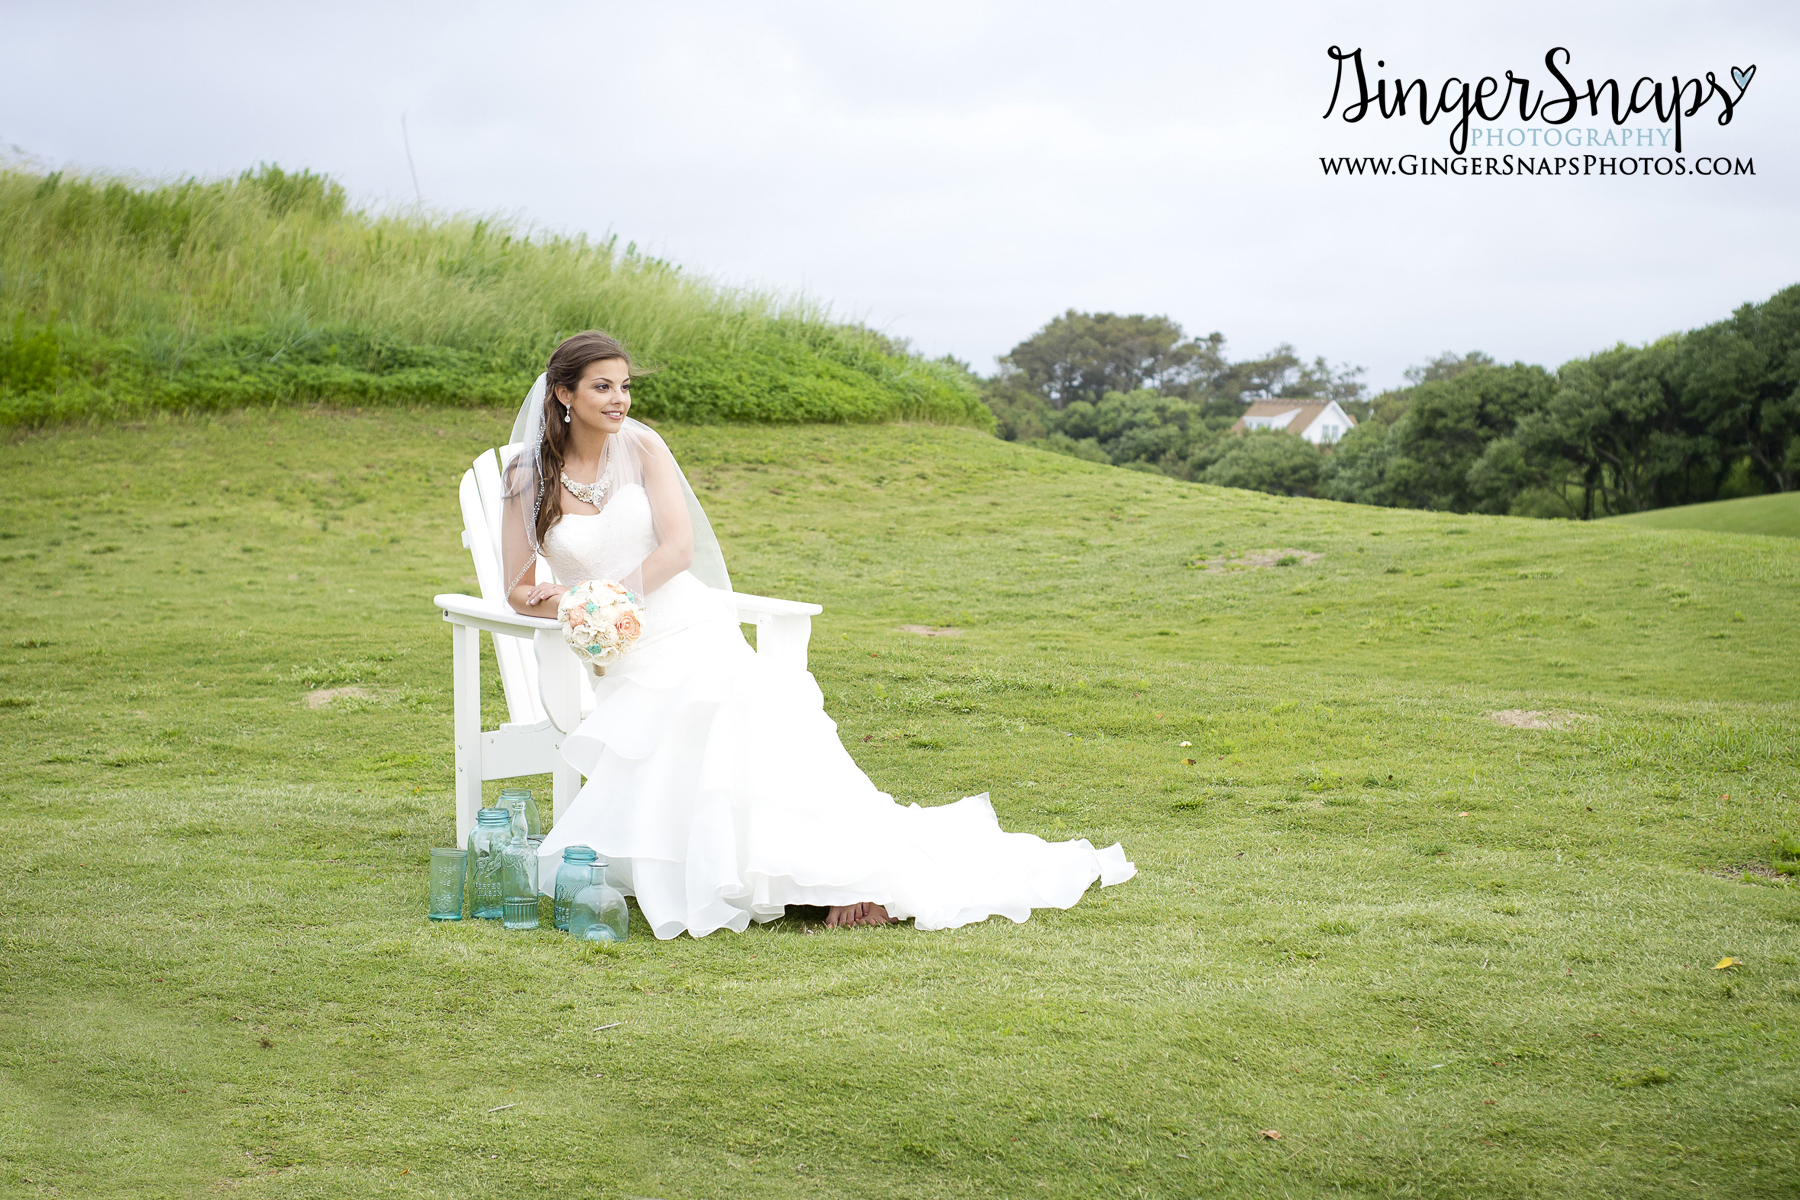 GingerSnaps Photography - 20.jpg